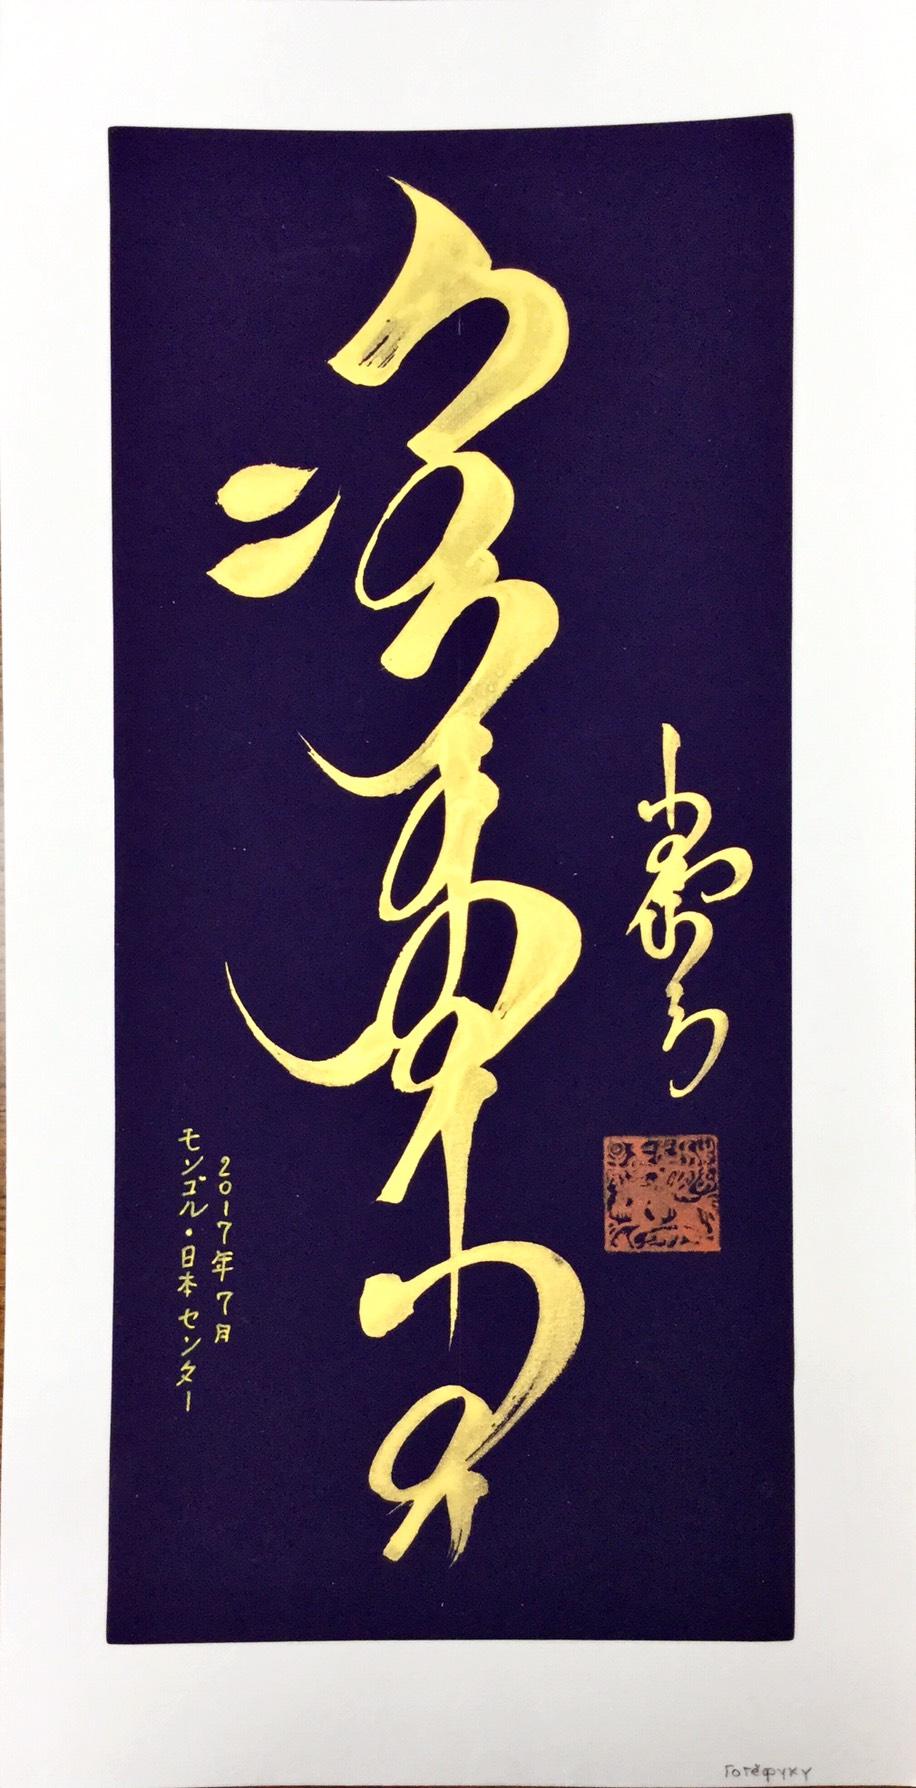 http://www.gogyofuku.co.jp/kan/entryimg/20170719prex00.jpg